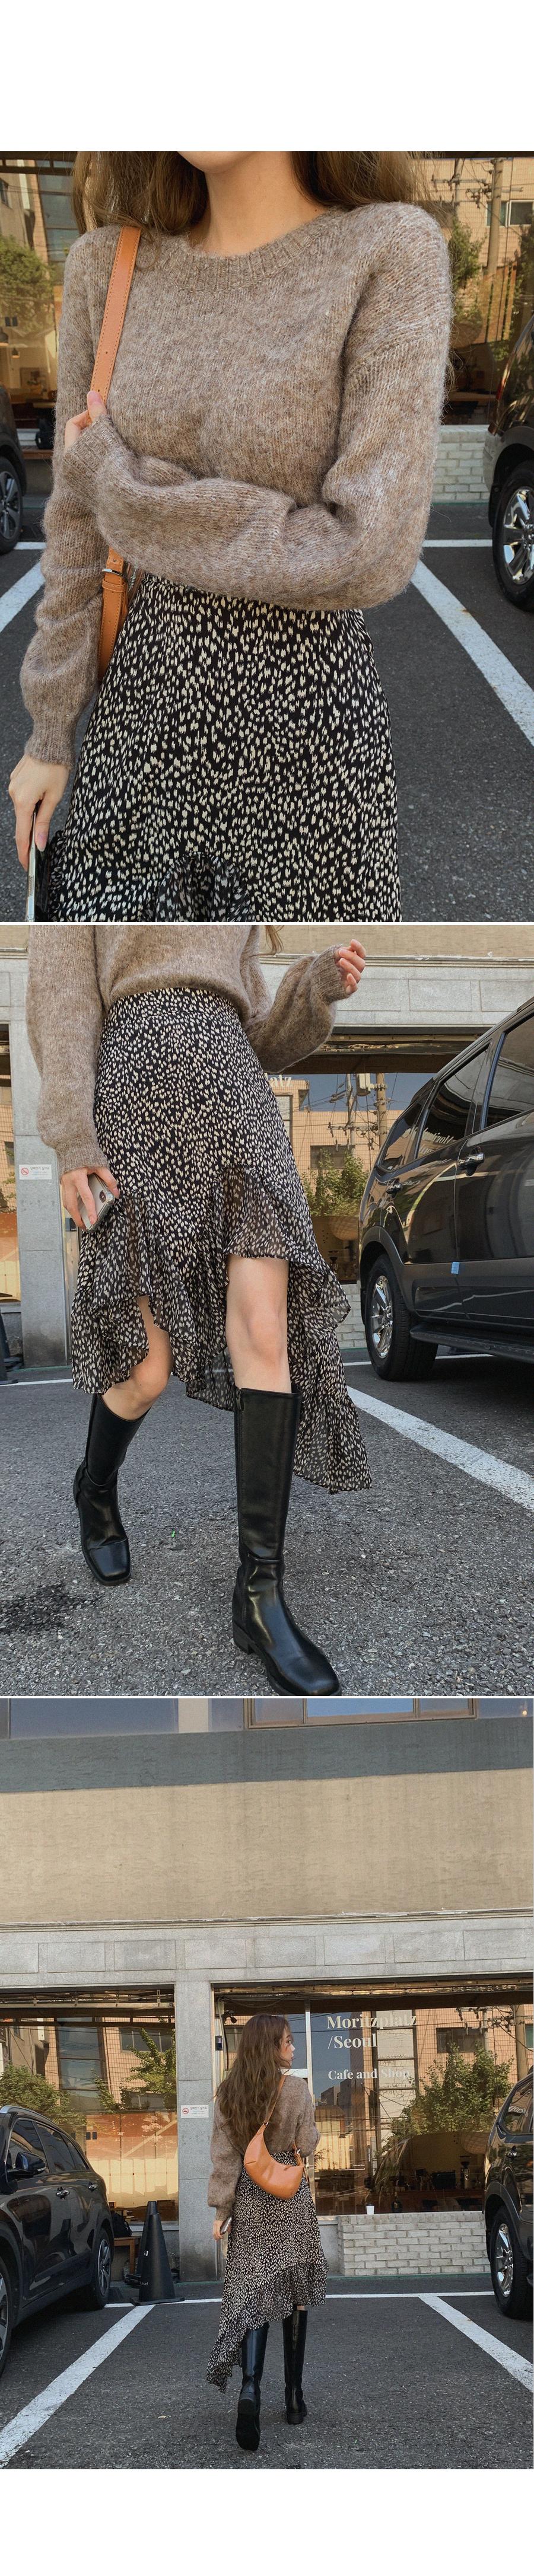 Leopard Rhythm Unballed Skirt